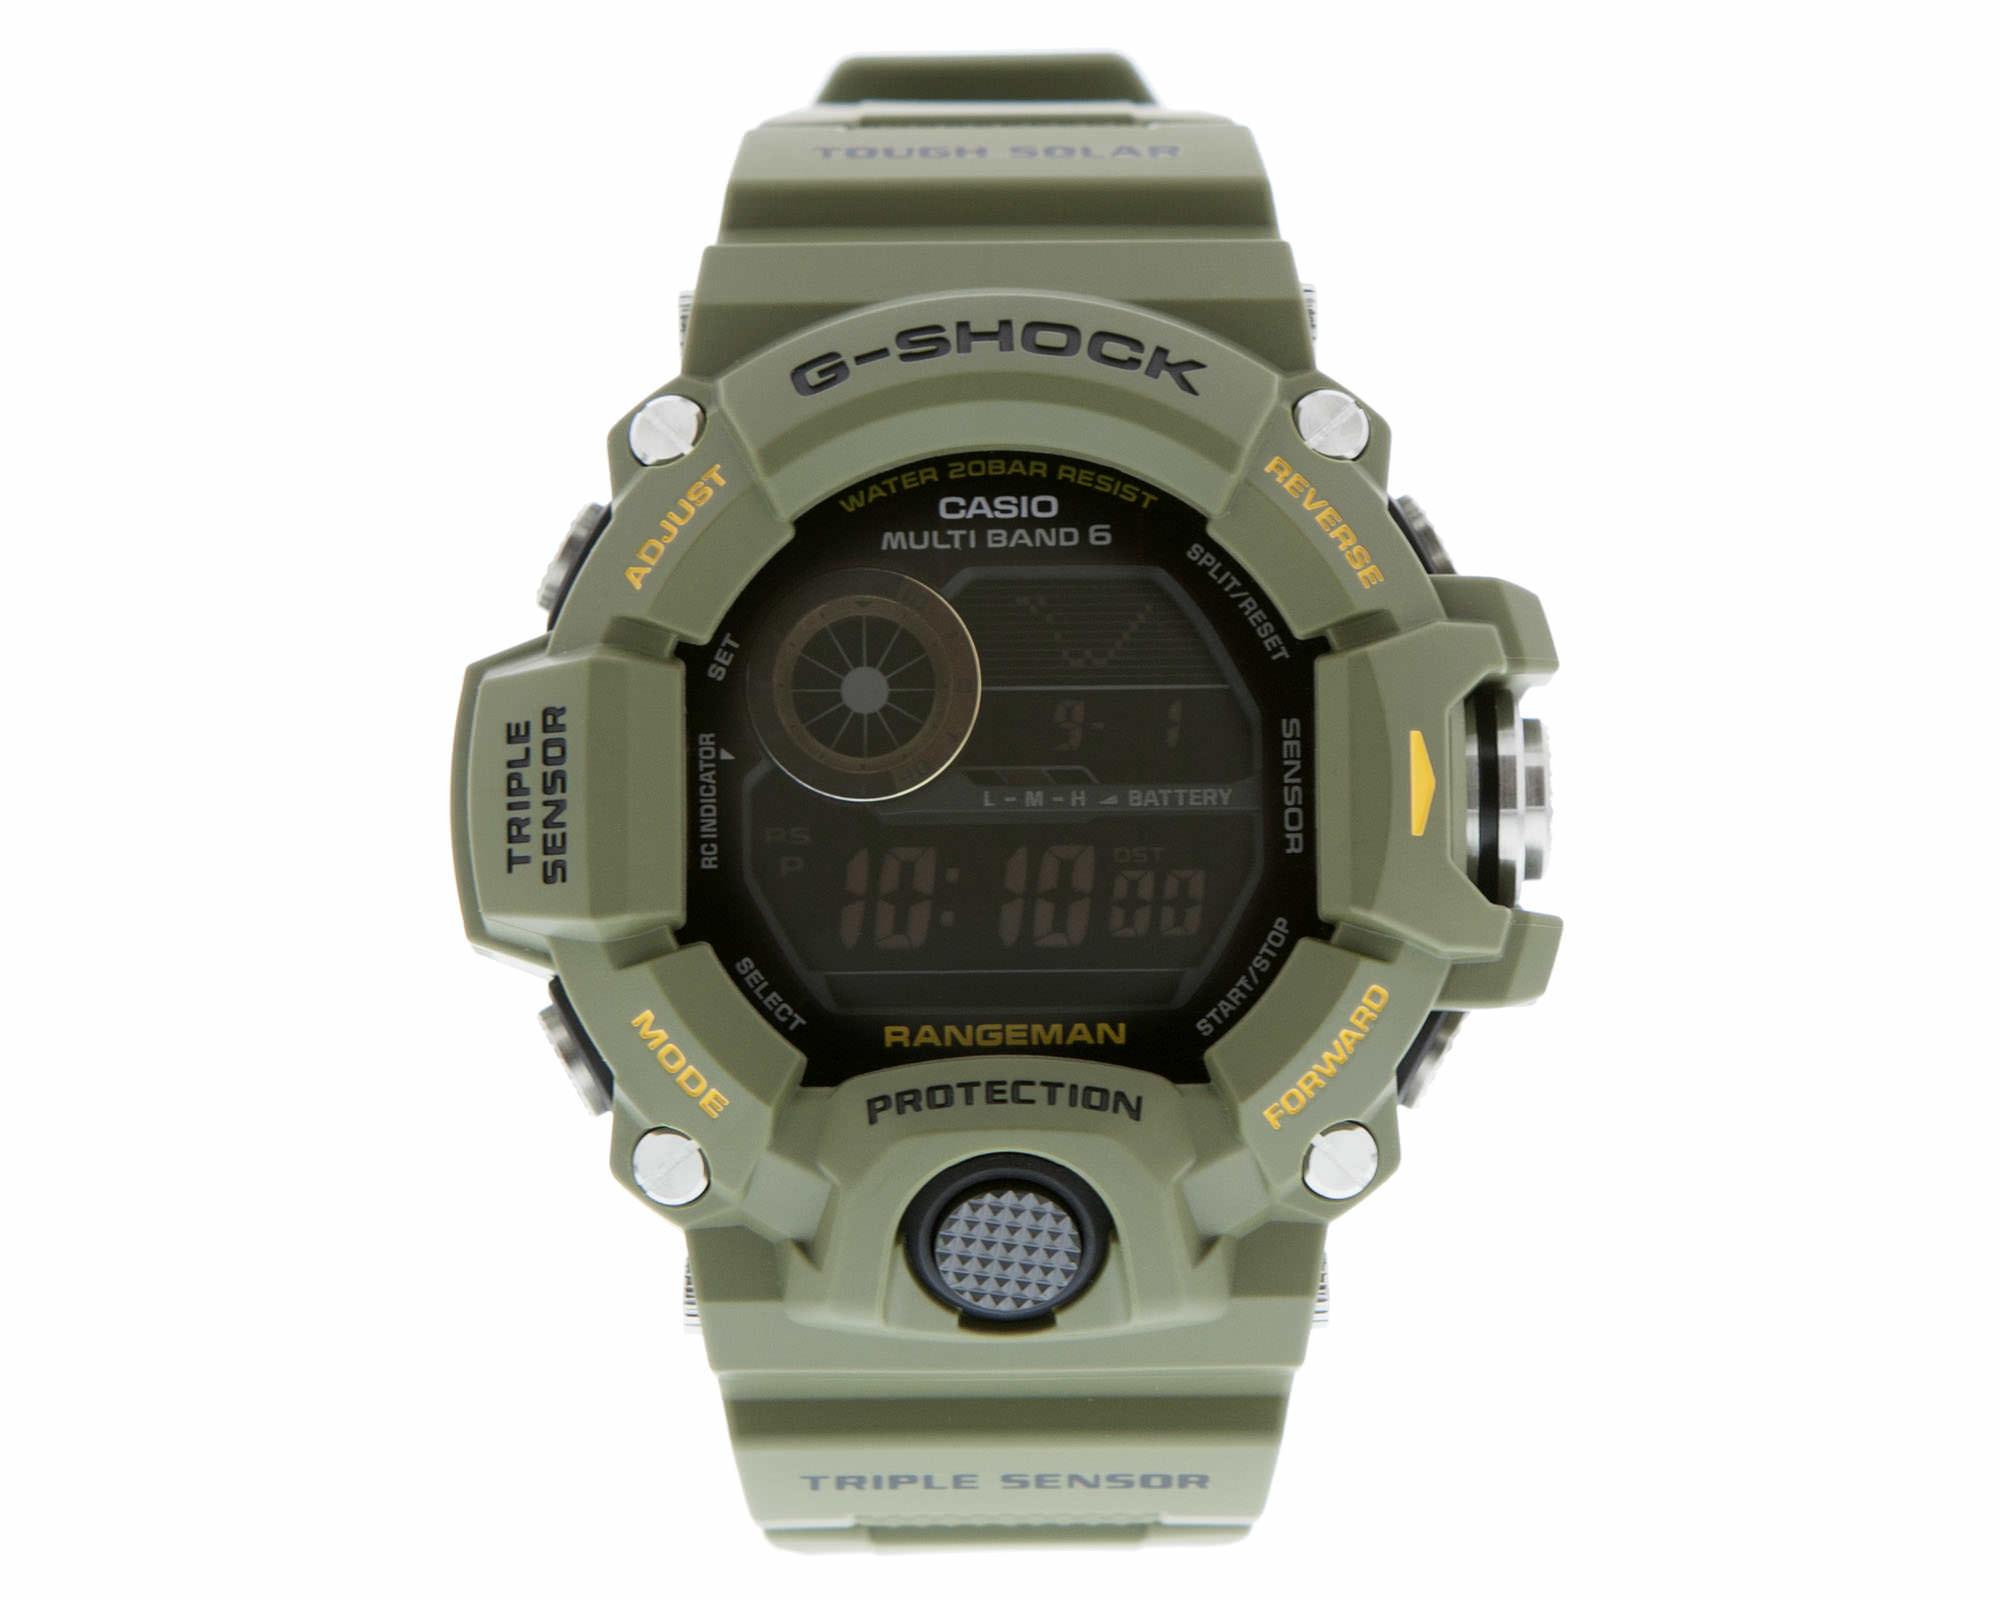 Casio G-Shock horloge GW-9400-3ER